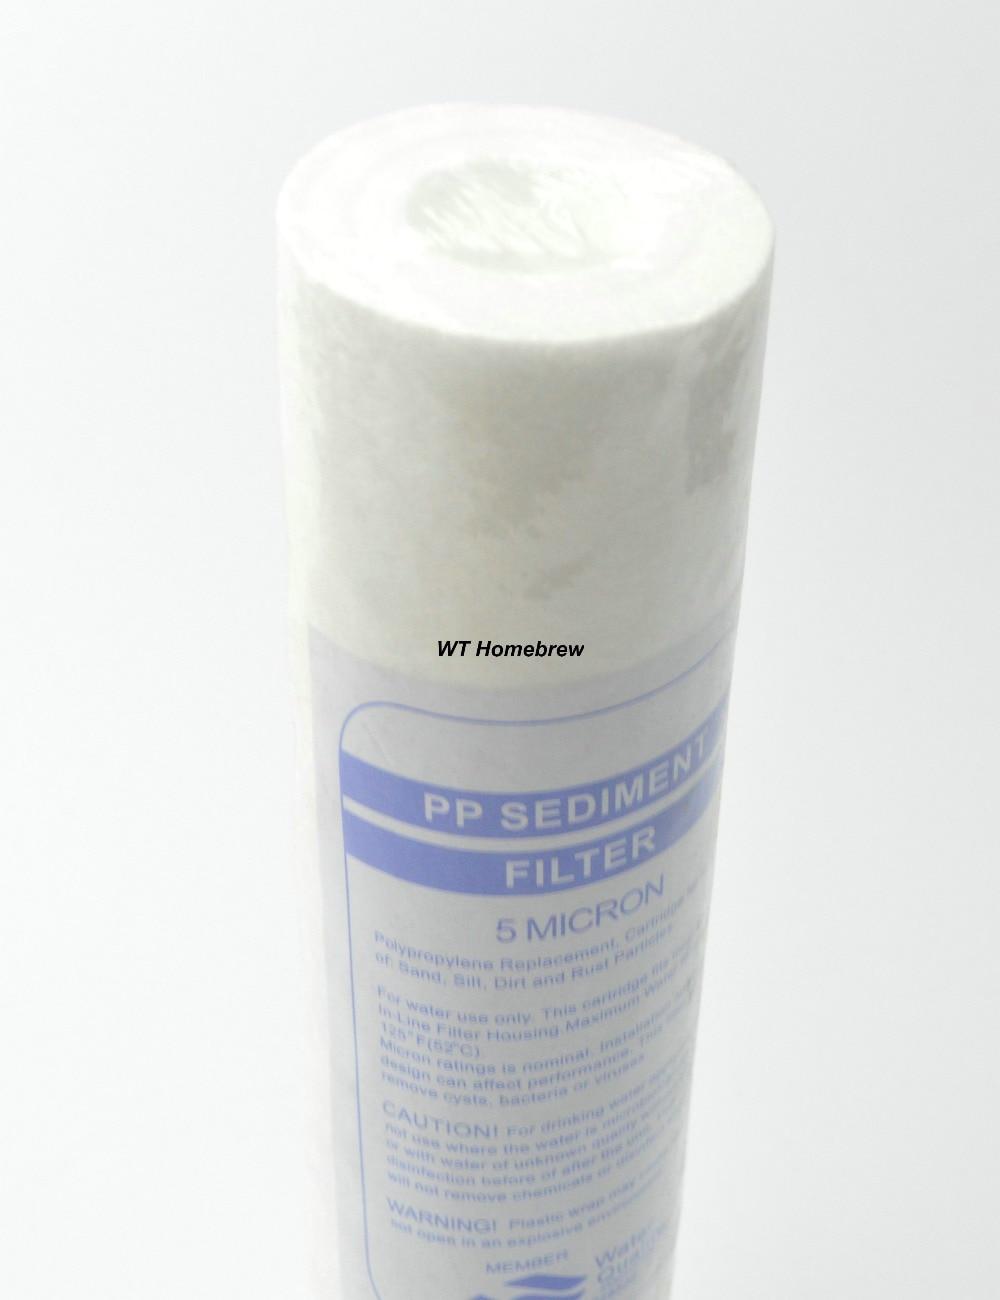 Water Filter Supplies Water Purifier Filter 5 Micron Pp Filter Sediment Water Filter Cartridge Homebrew Filter Supplies Removing Yeastjpg